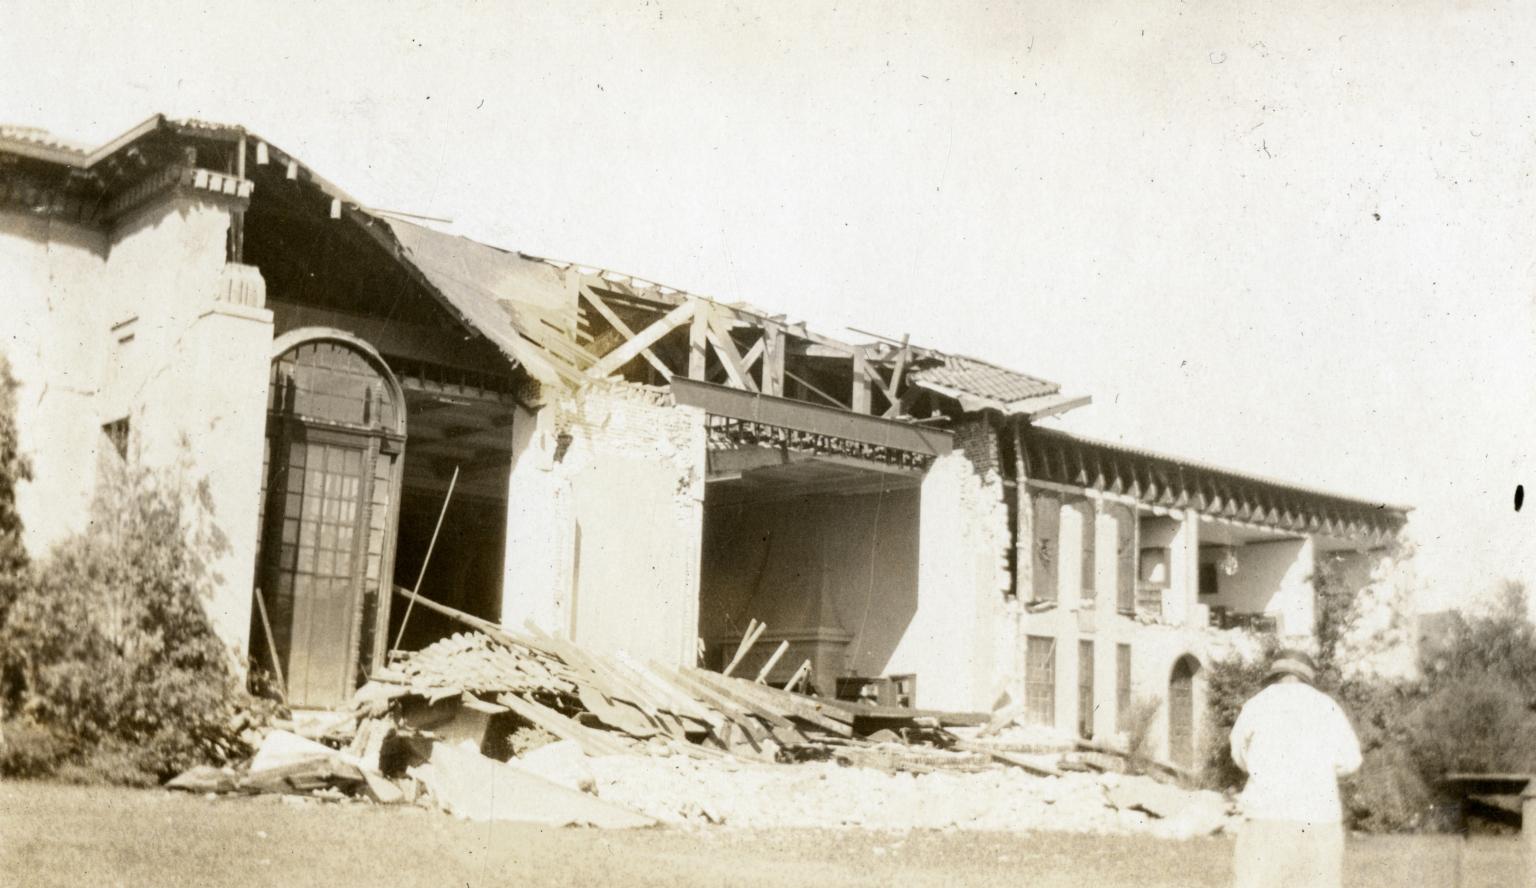 Santa Barbara 1925 Earthquake Damage - Santa Barbara Public Library